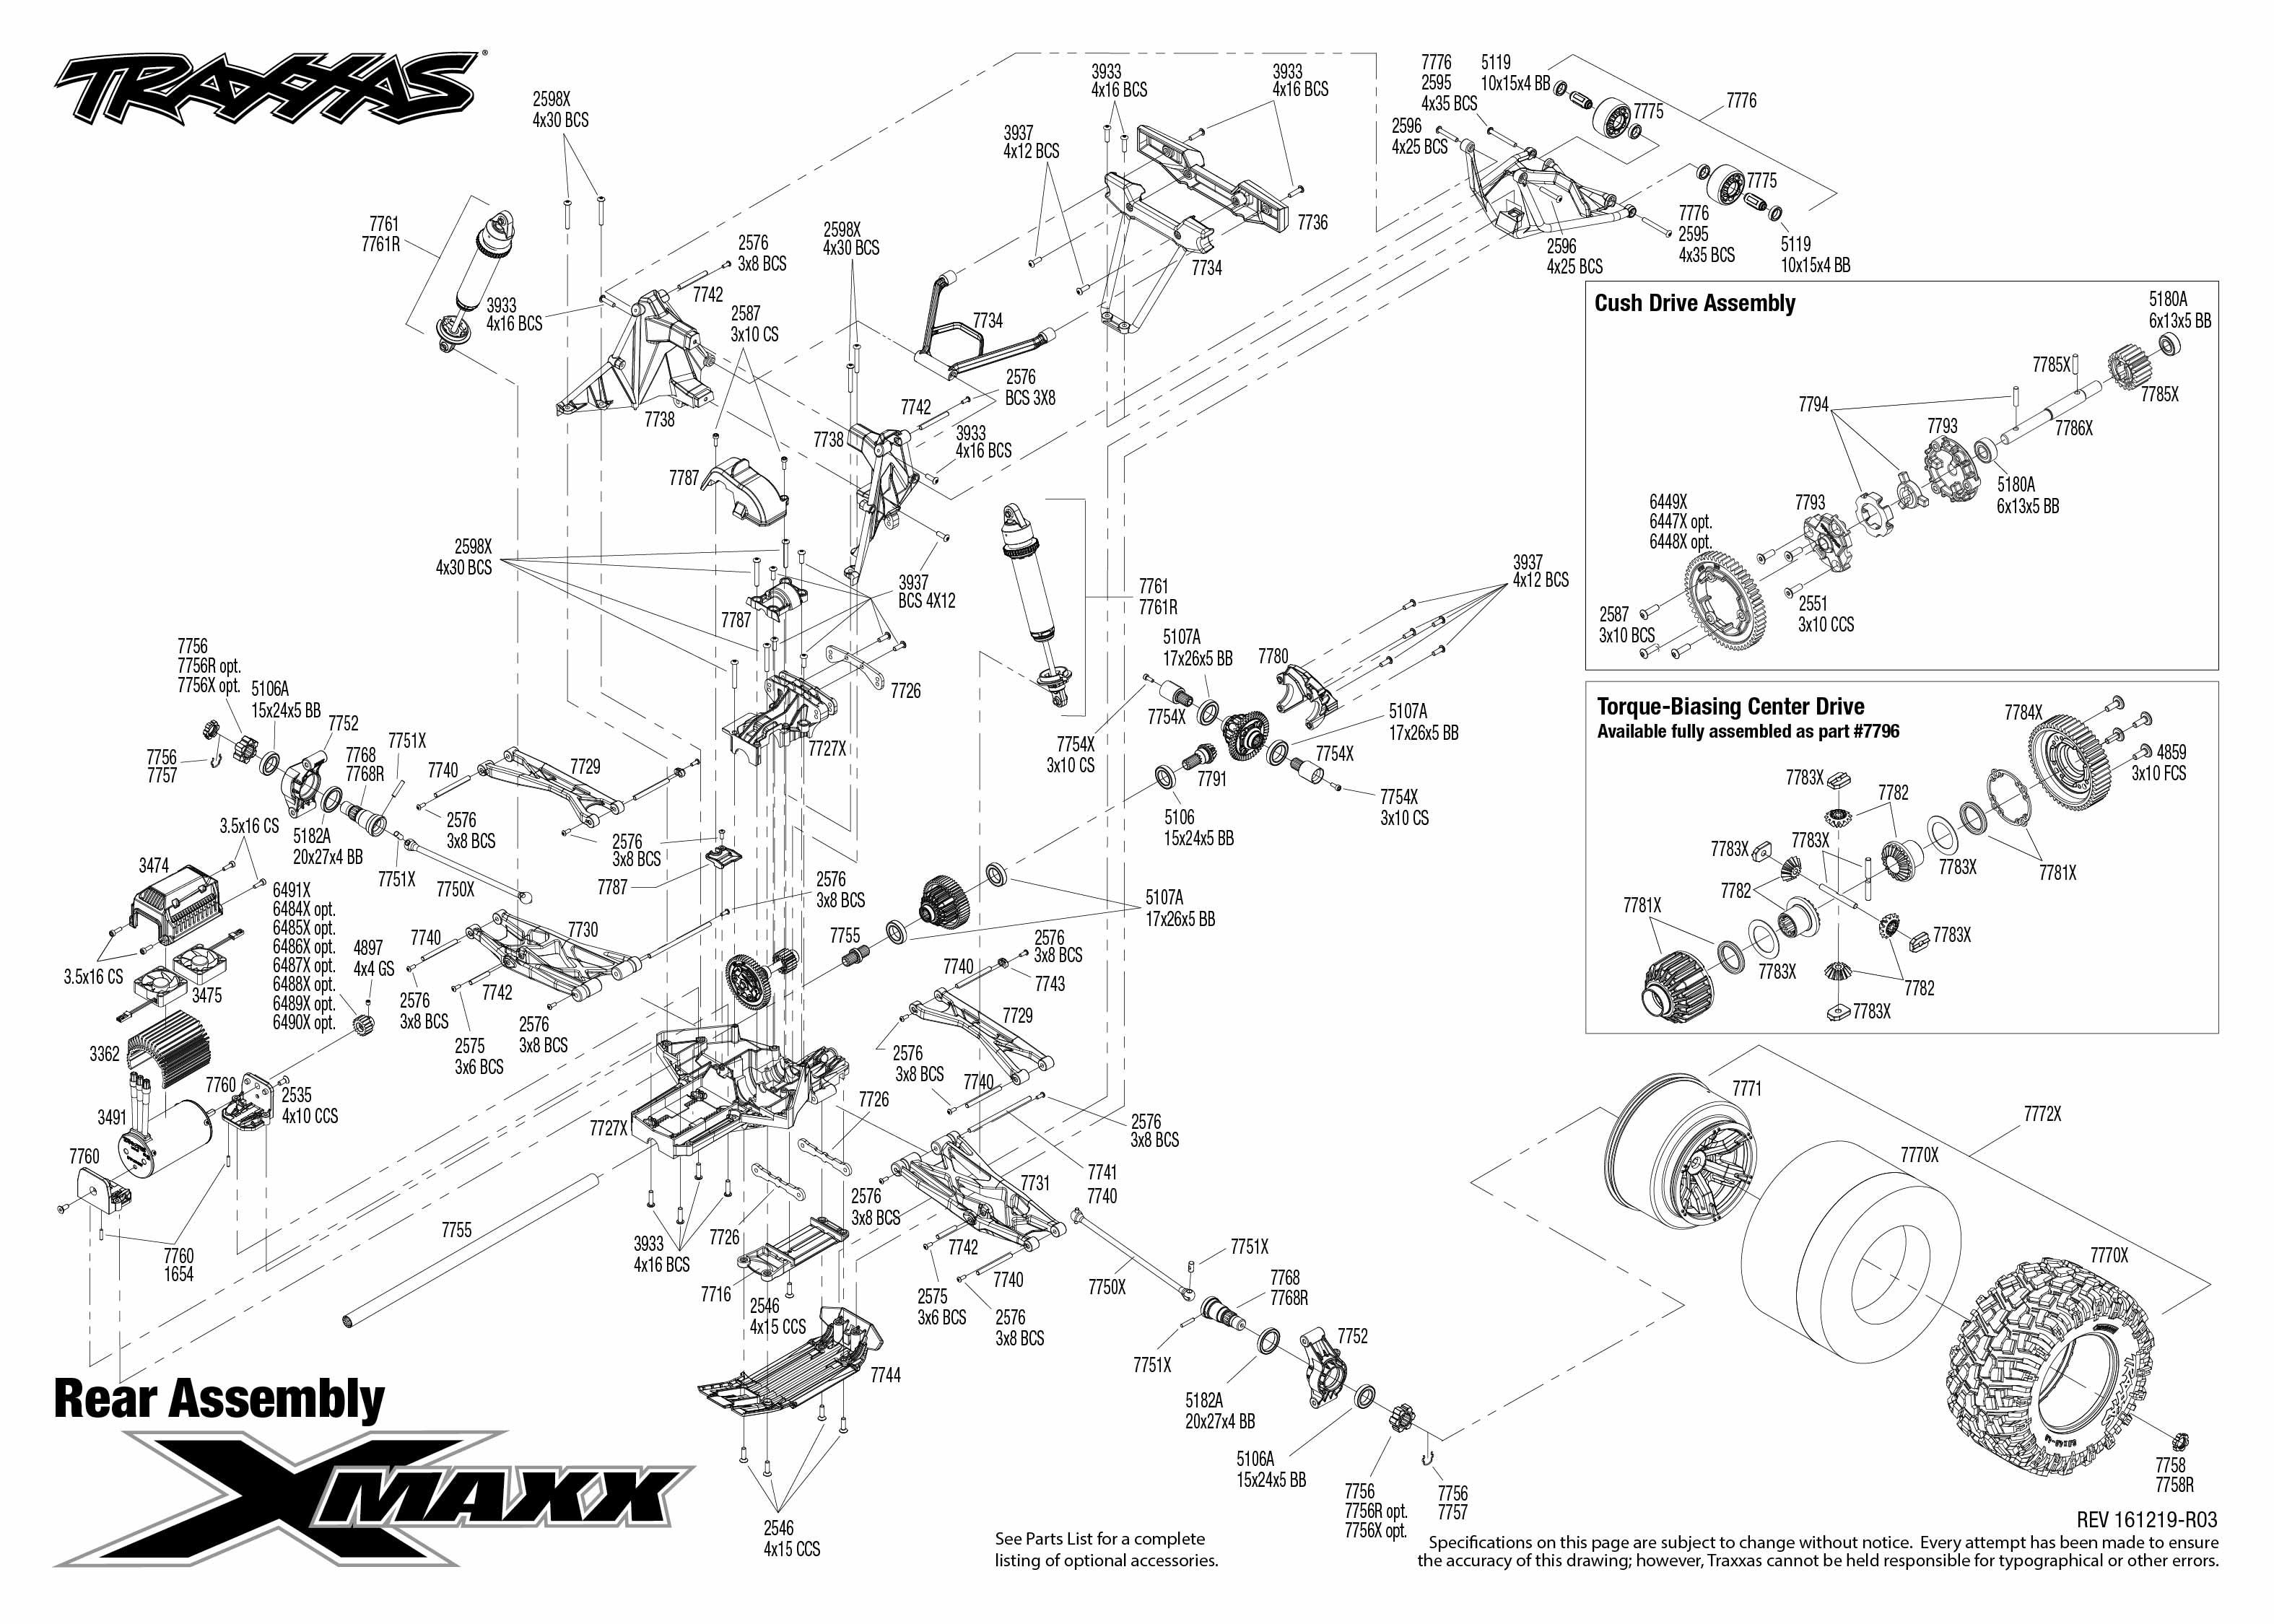 Exploded view: Traxxas X-Maxx 1:5 8S 4WD TQi Brushless TSM